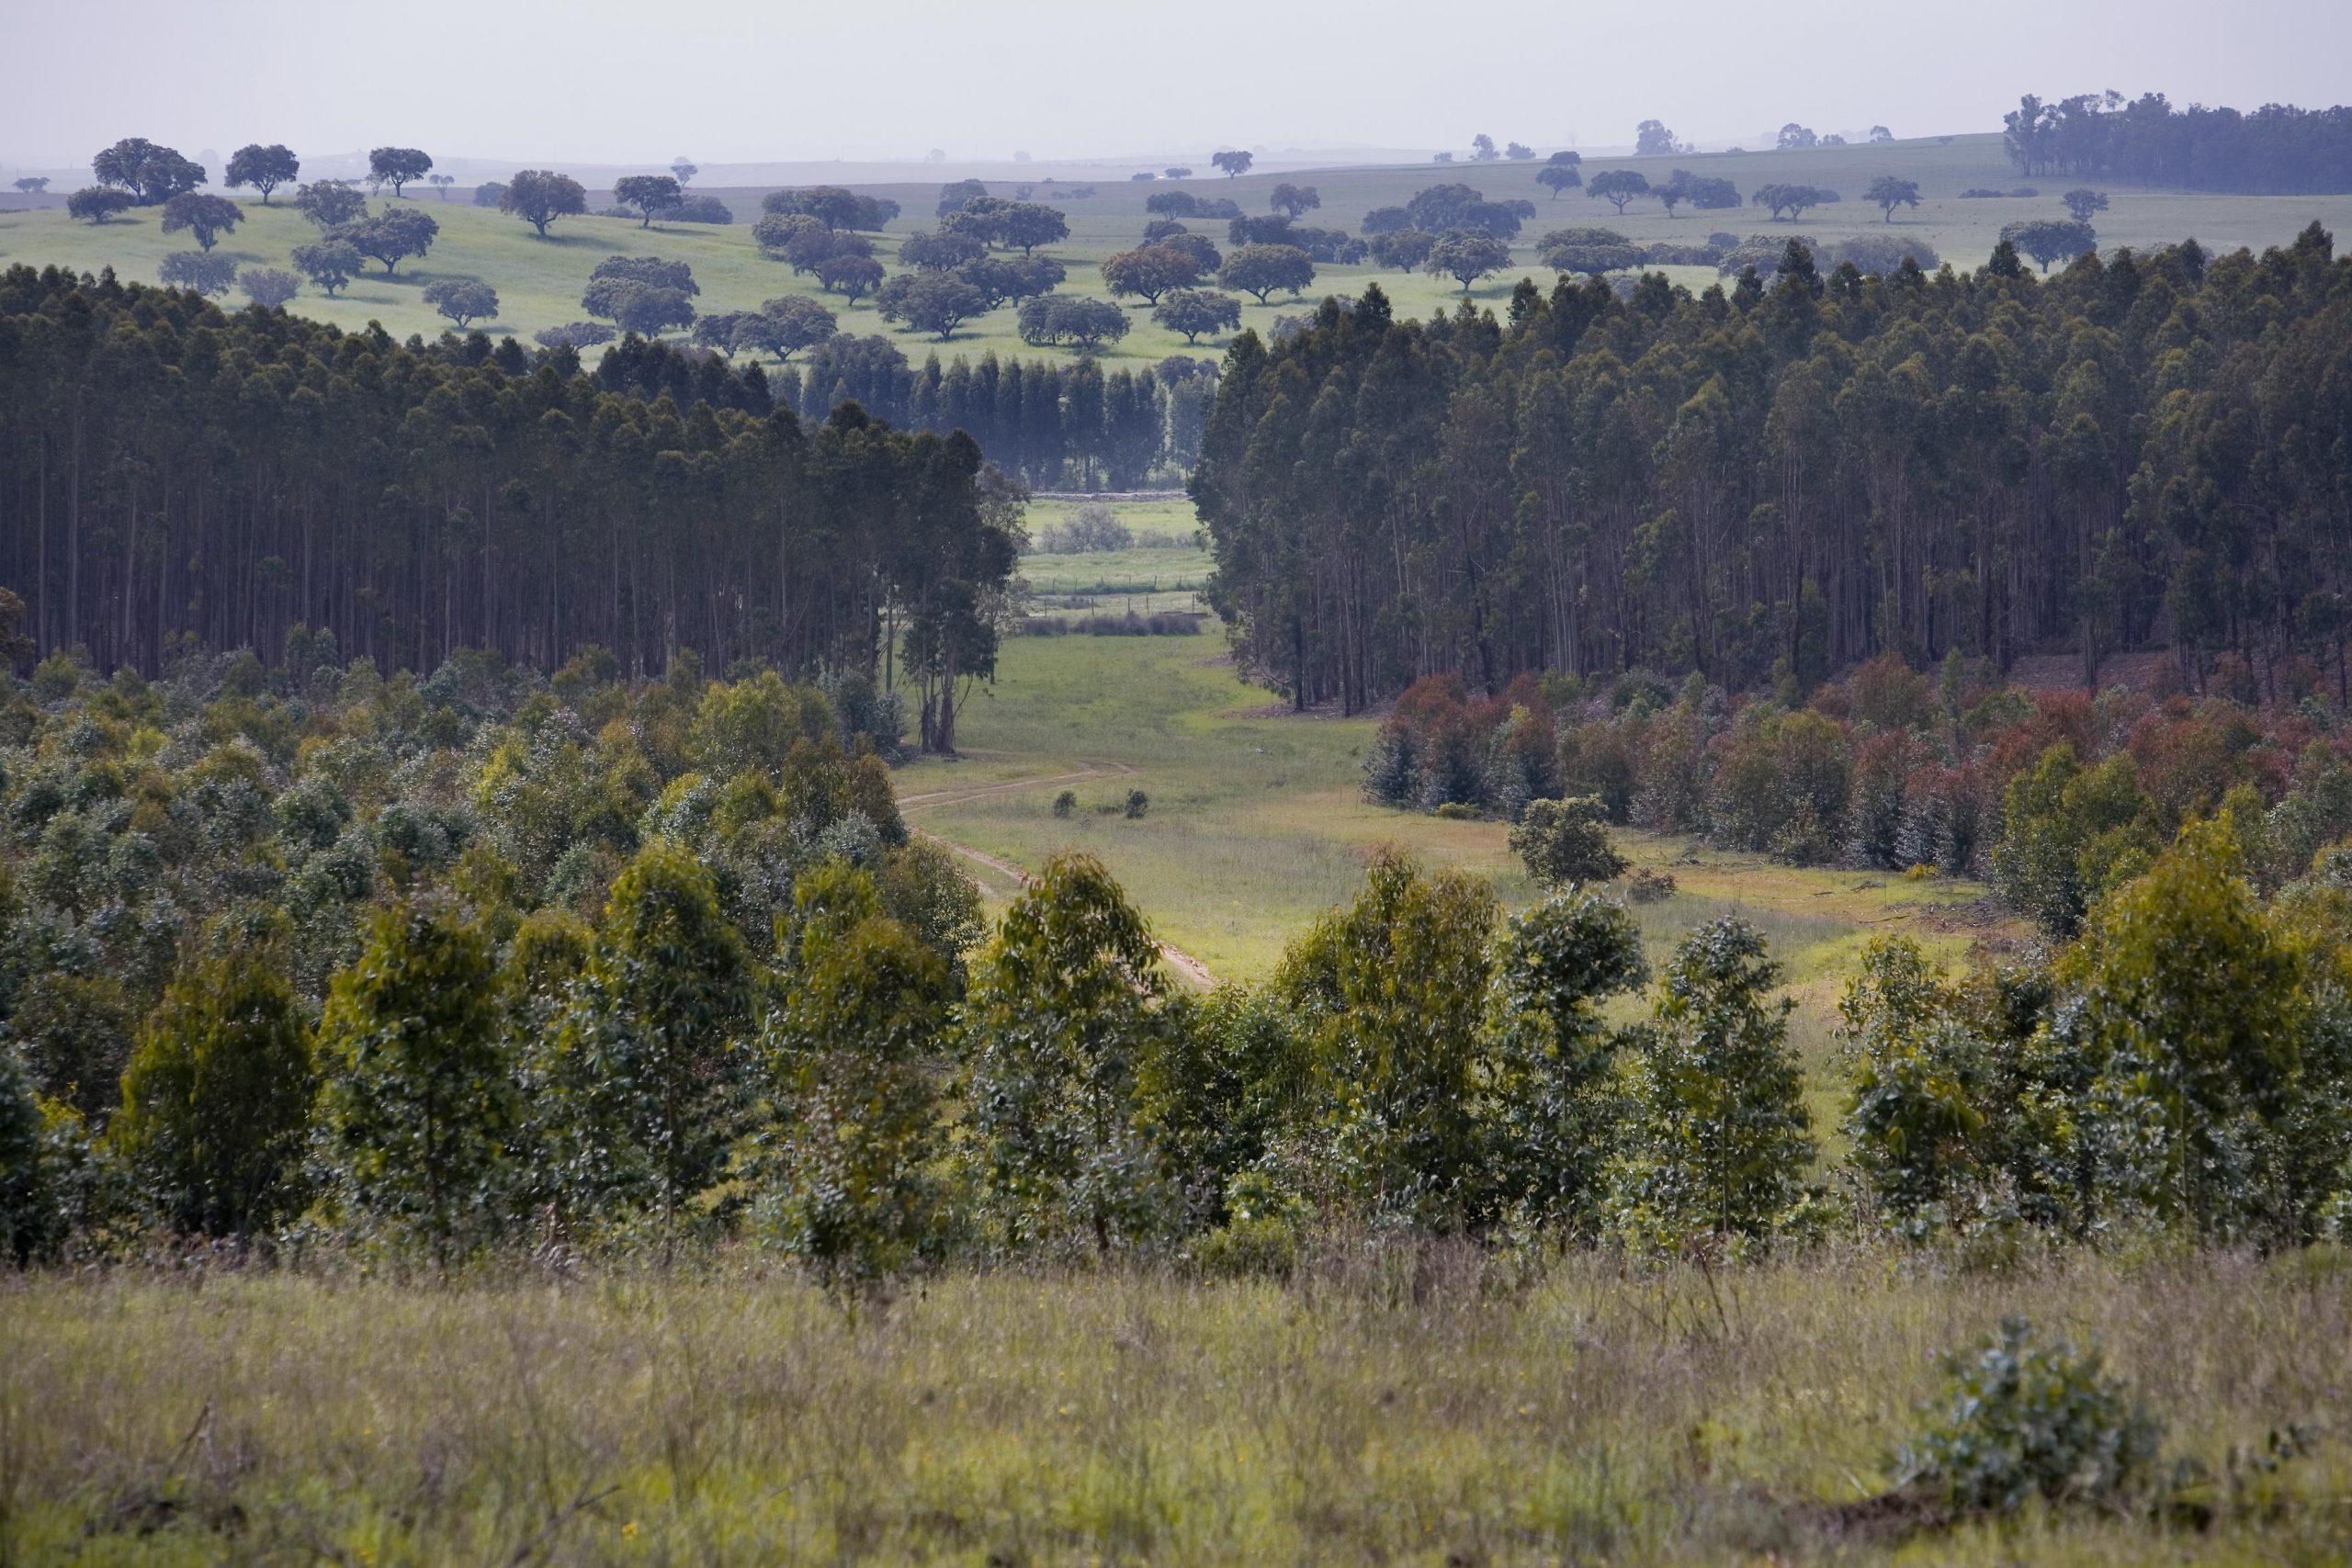 INESC TEC e FEUP querem tornar a floresta portuguesa mais segura